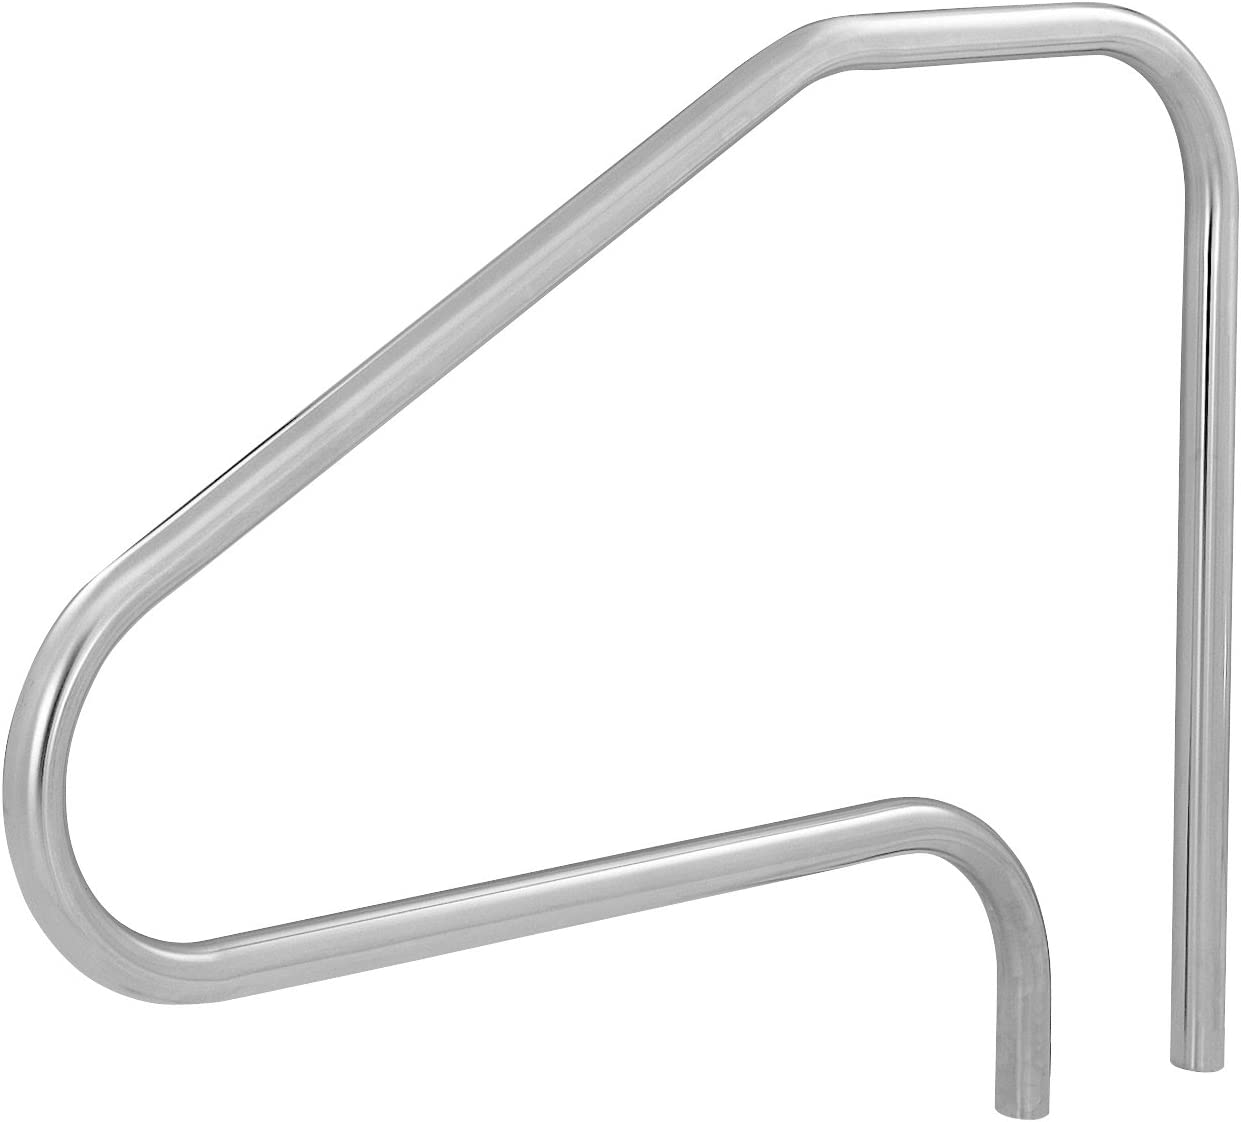 Tiamat 80101 Stainless Steel Swimming Memphis Mall 48